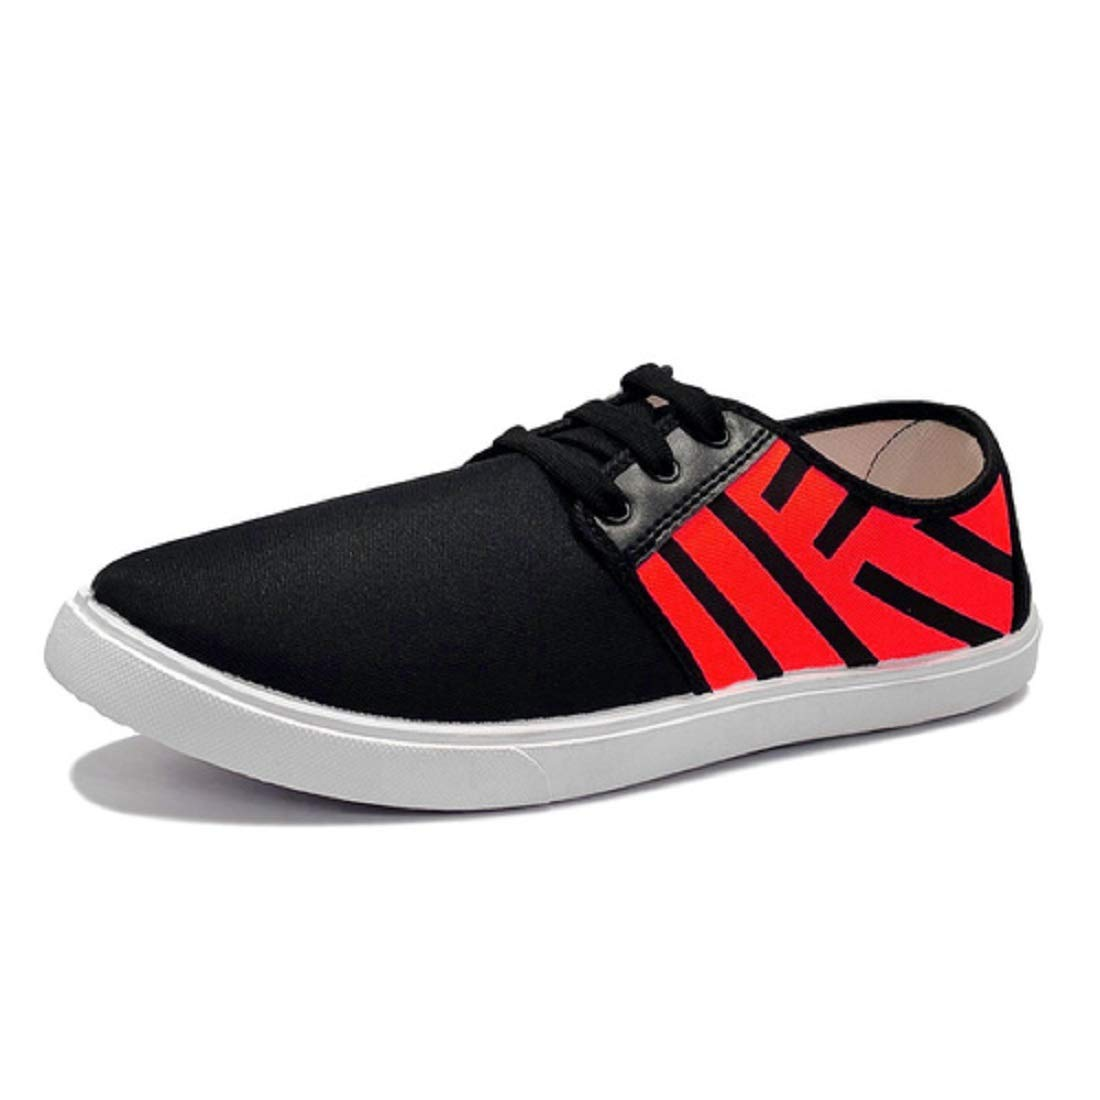 Zenwear Casual Shoes, Lace Up, Sneaker for Men,Black